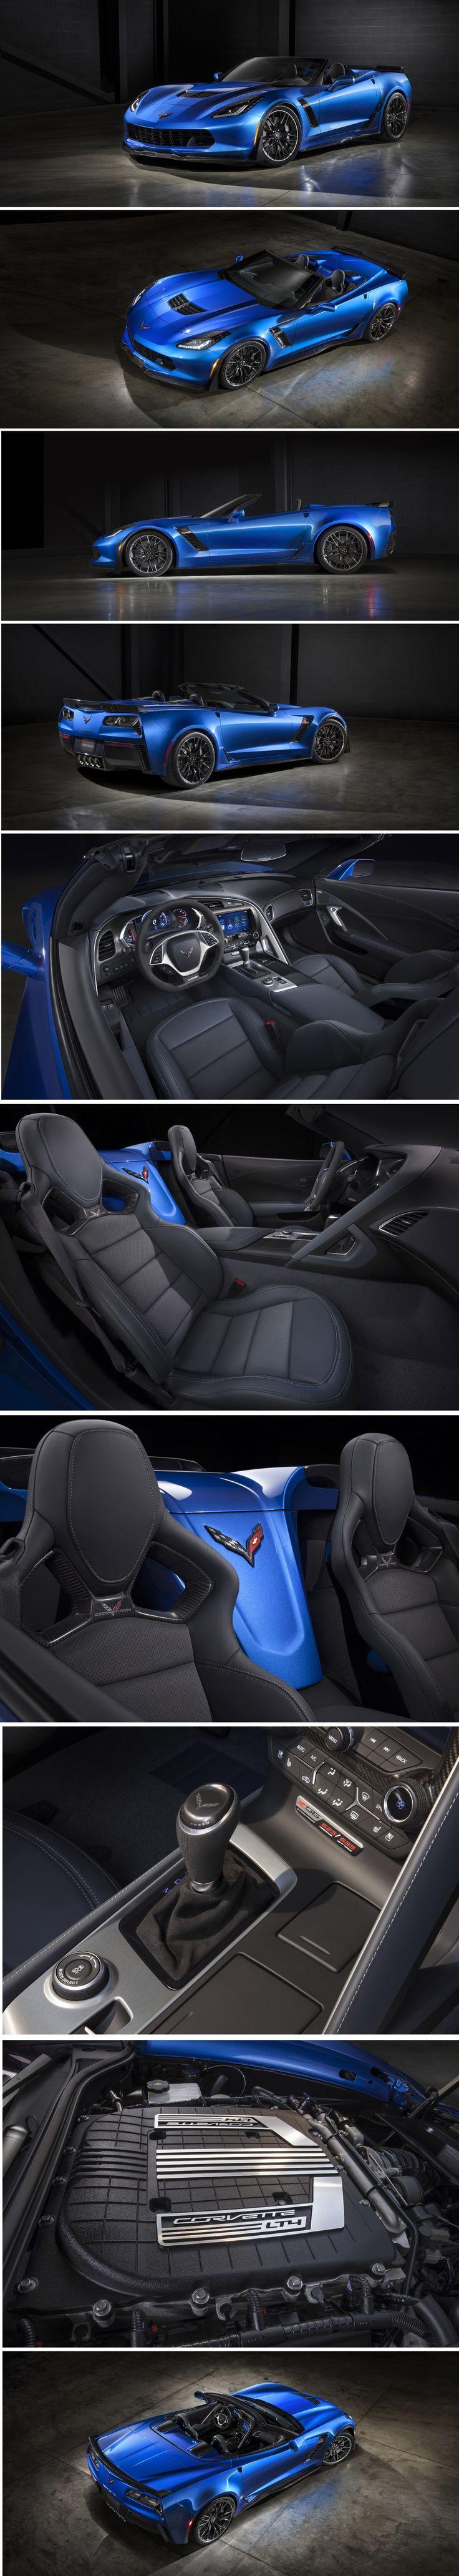 2015 Chevrolet Corvette Z06 Convertible - bucket list - love this car!